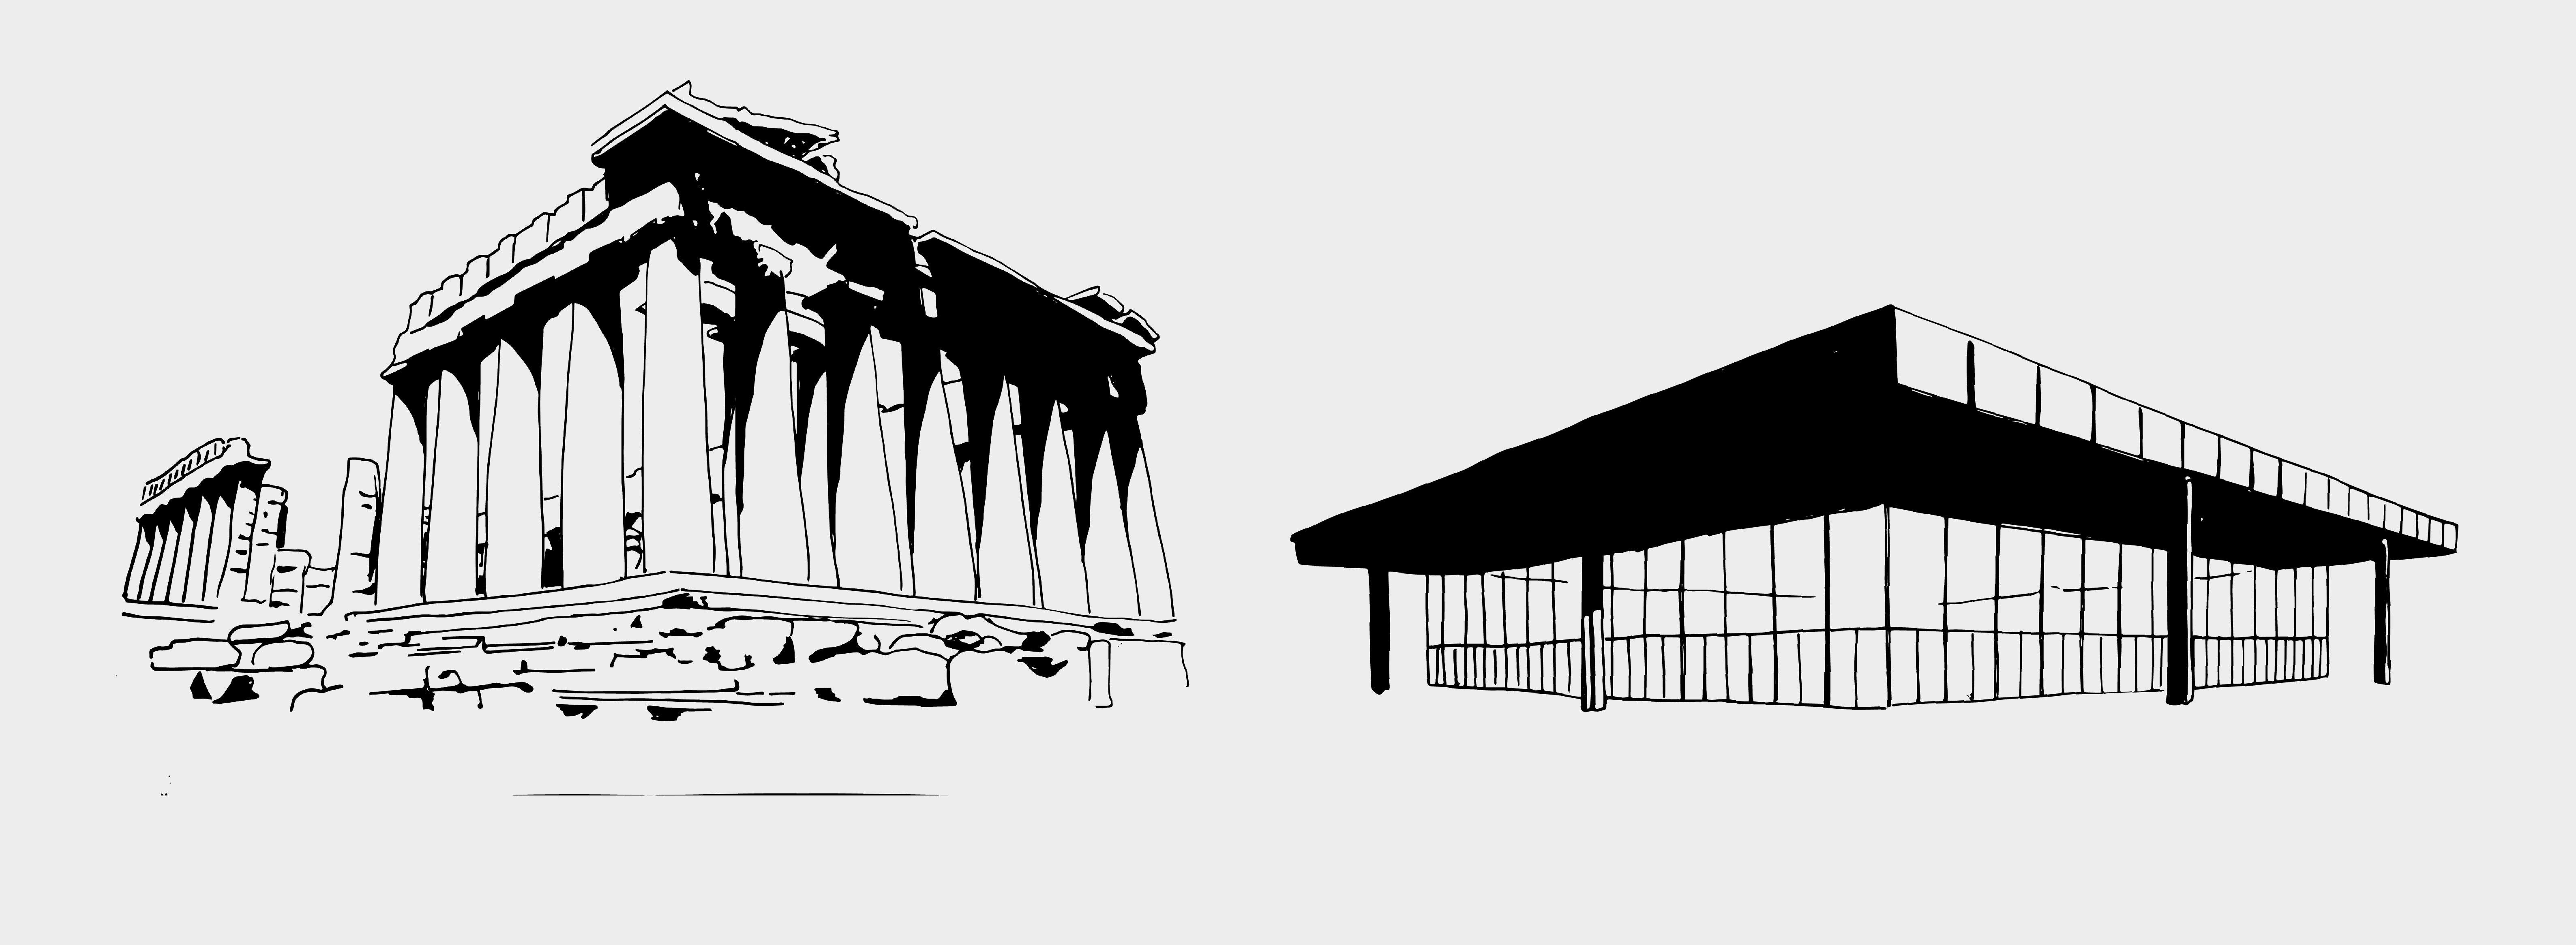 Parthenon Athen, 447 v. Chr. – Ludwig Mies van der Rohe, Neue Nationalgalerie, Berlin, 1968